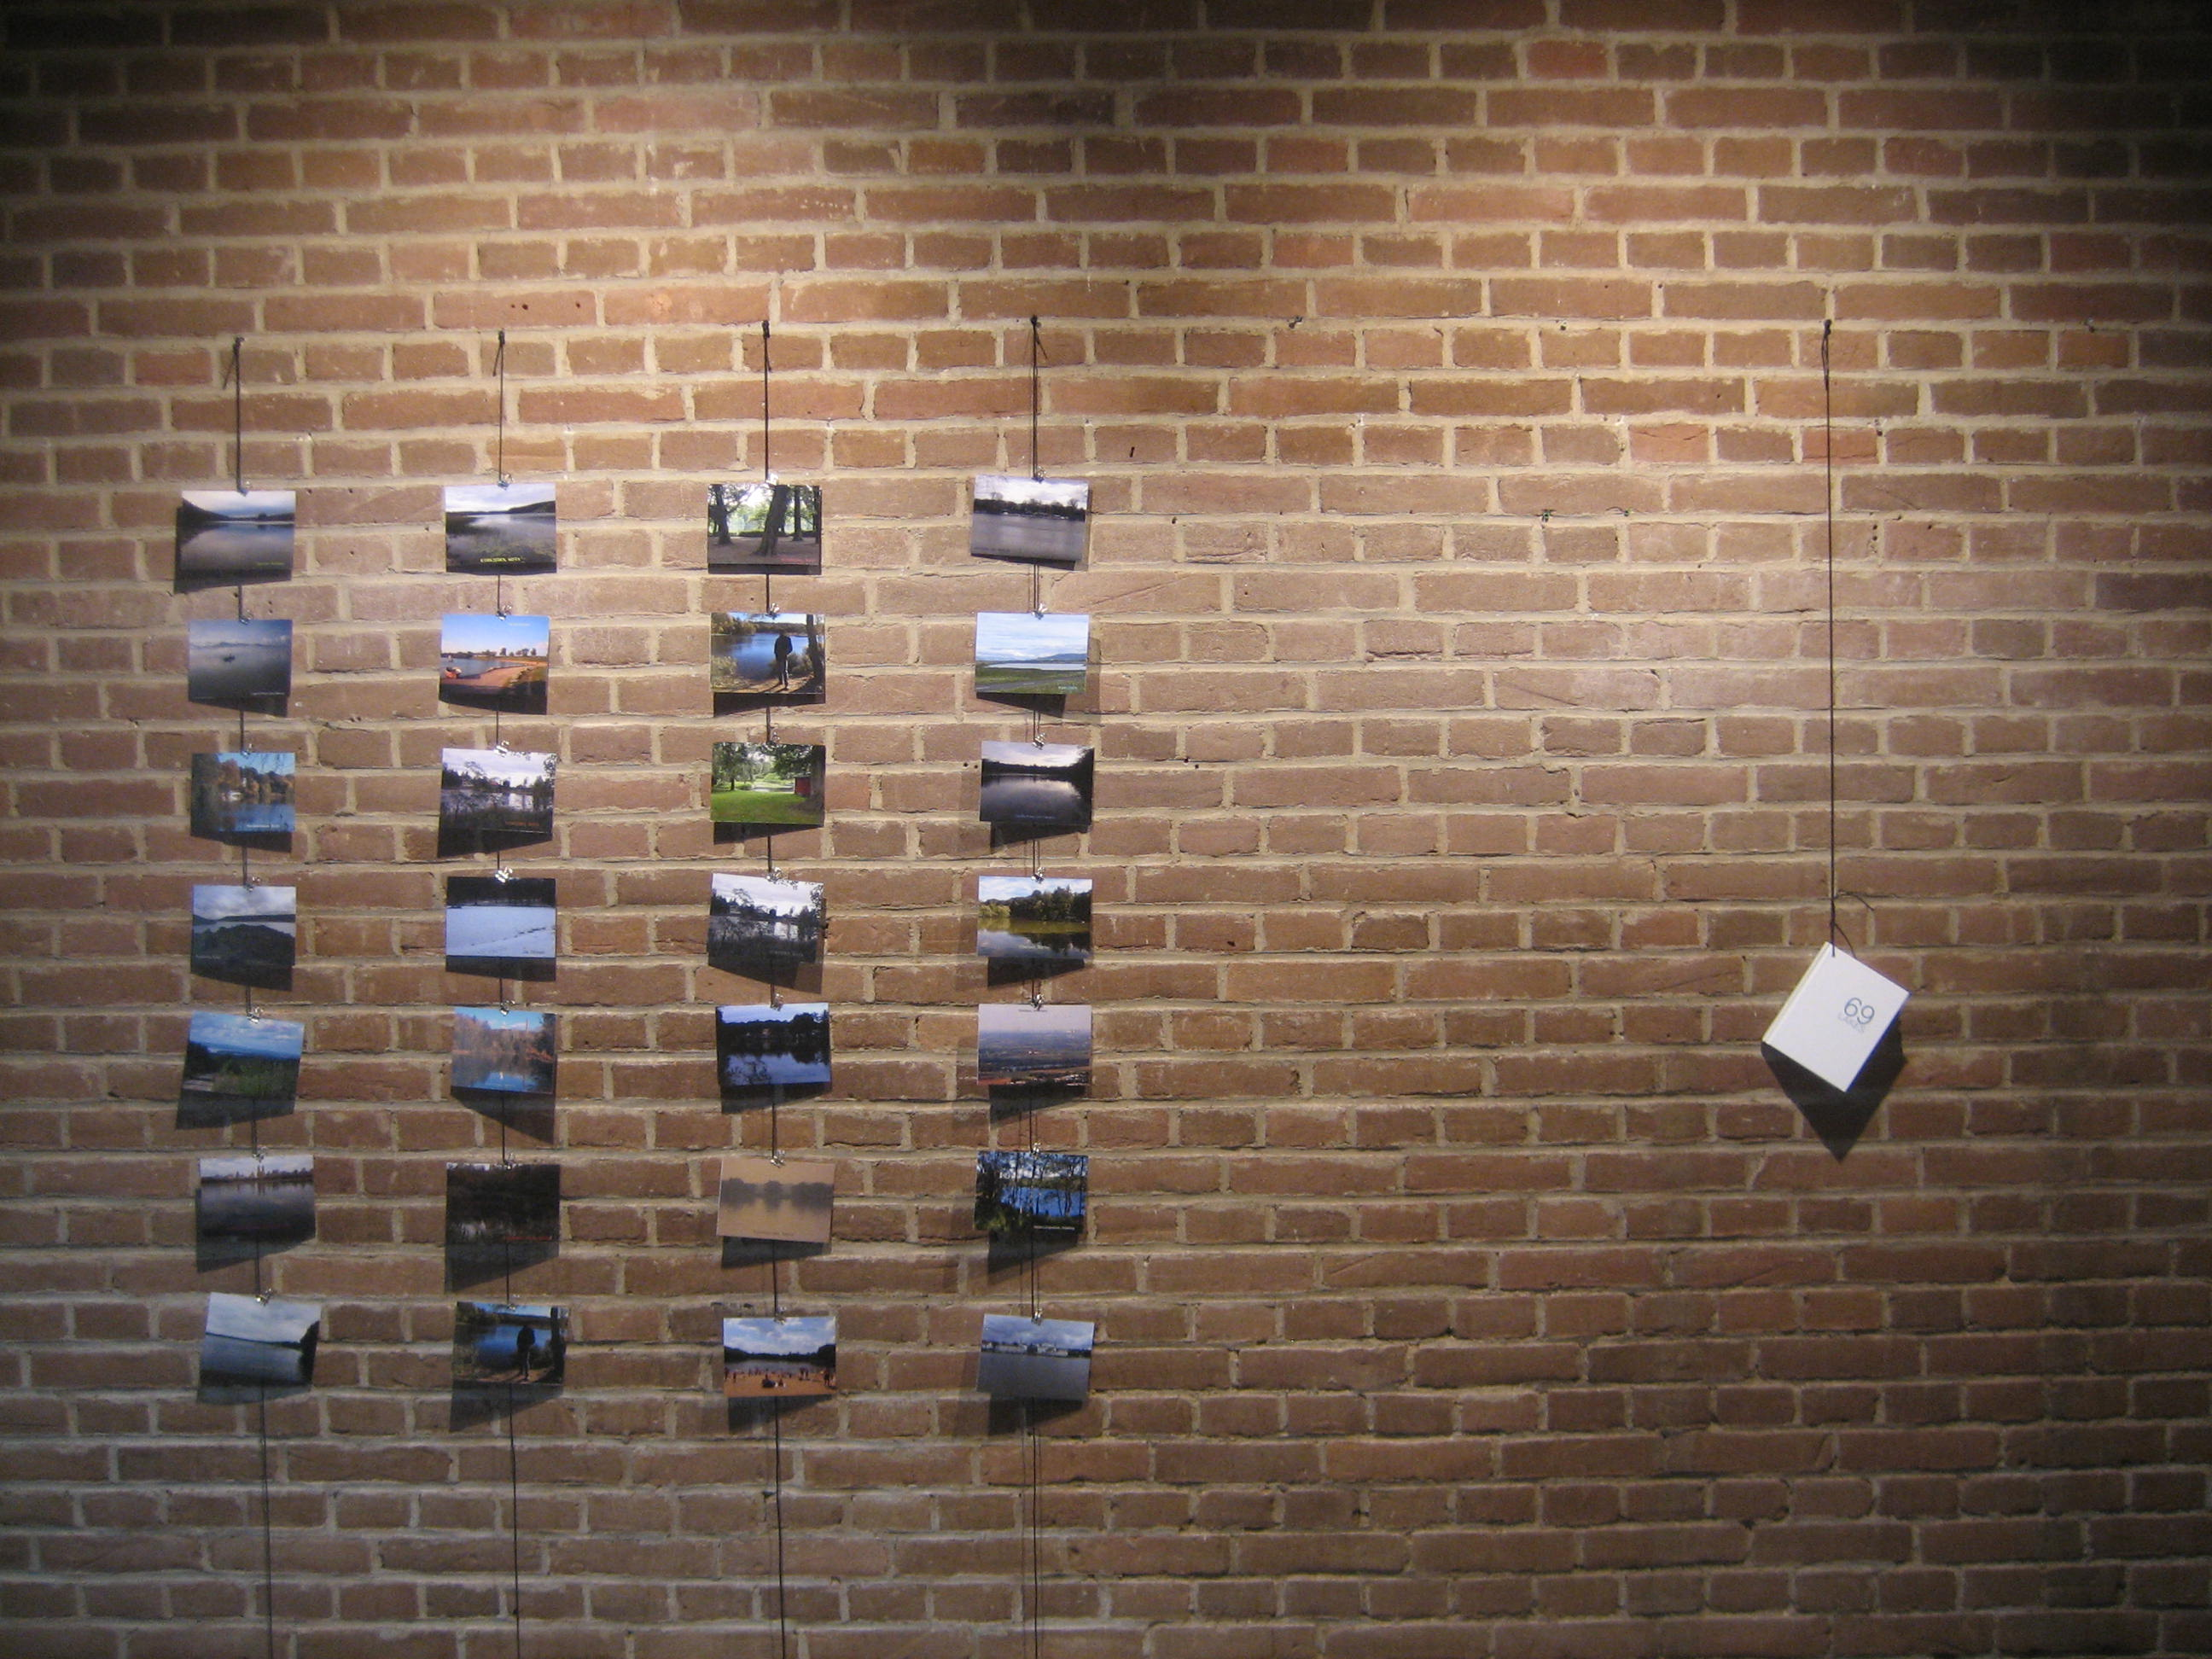 Tore Svensson. Galerie Marzee, januari 2018. Foto Esther Doornbusch, CC BY 4.0